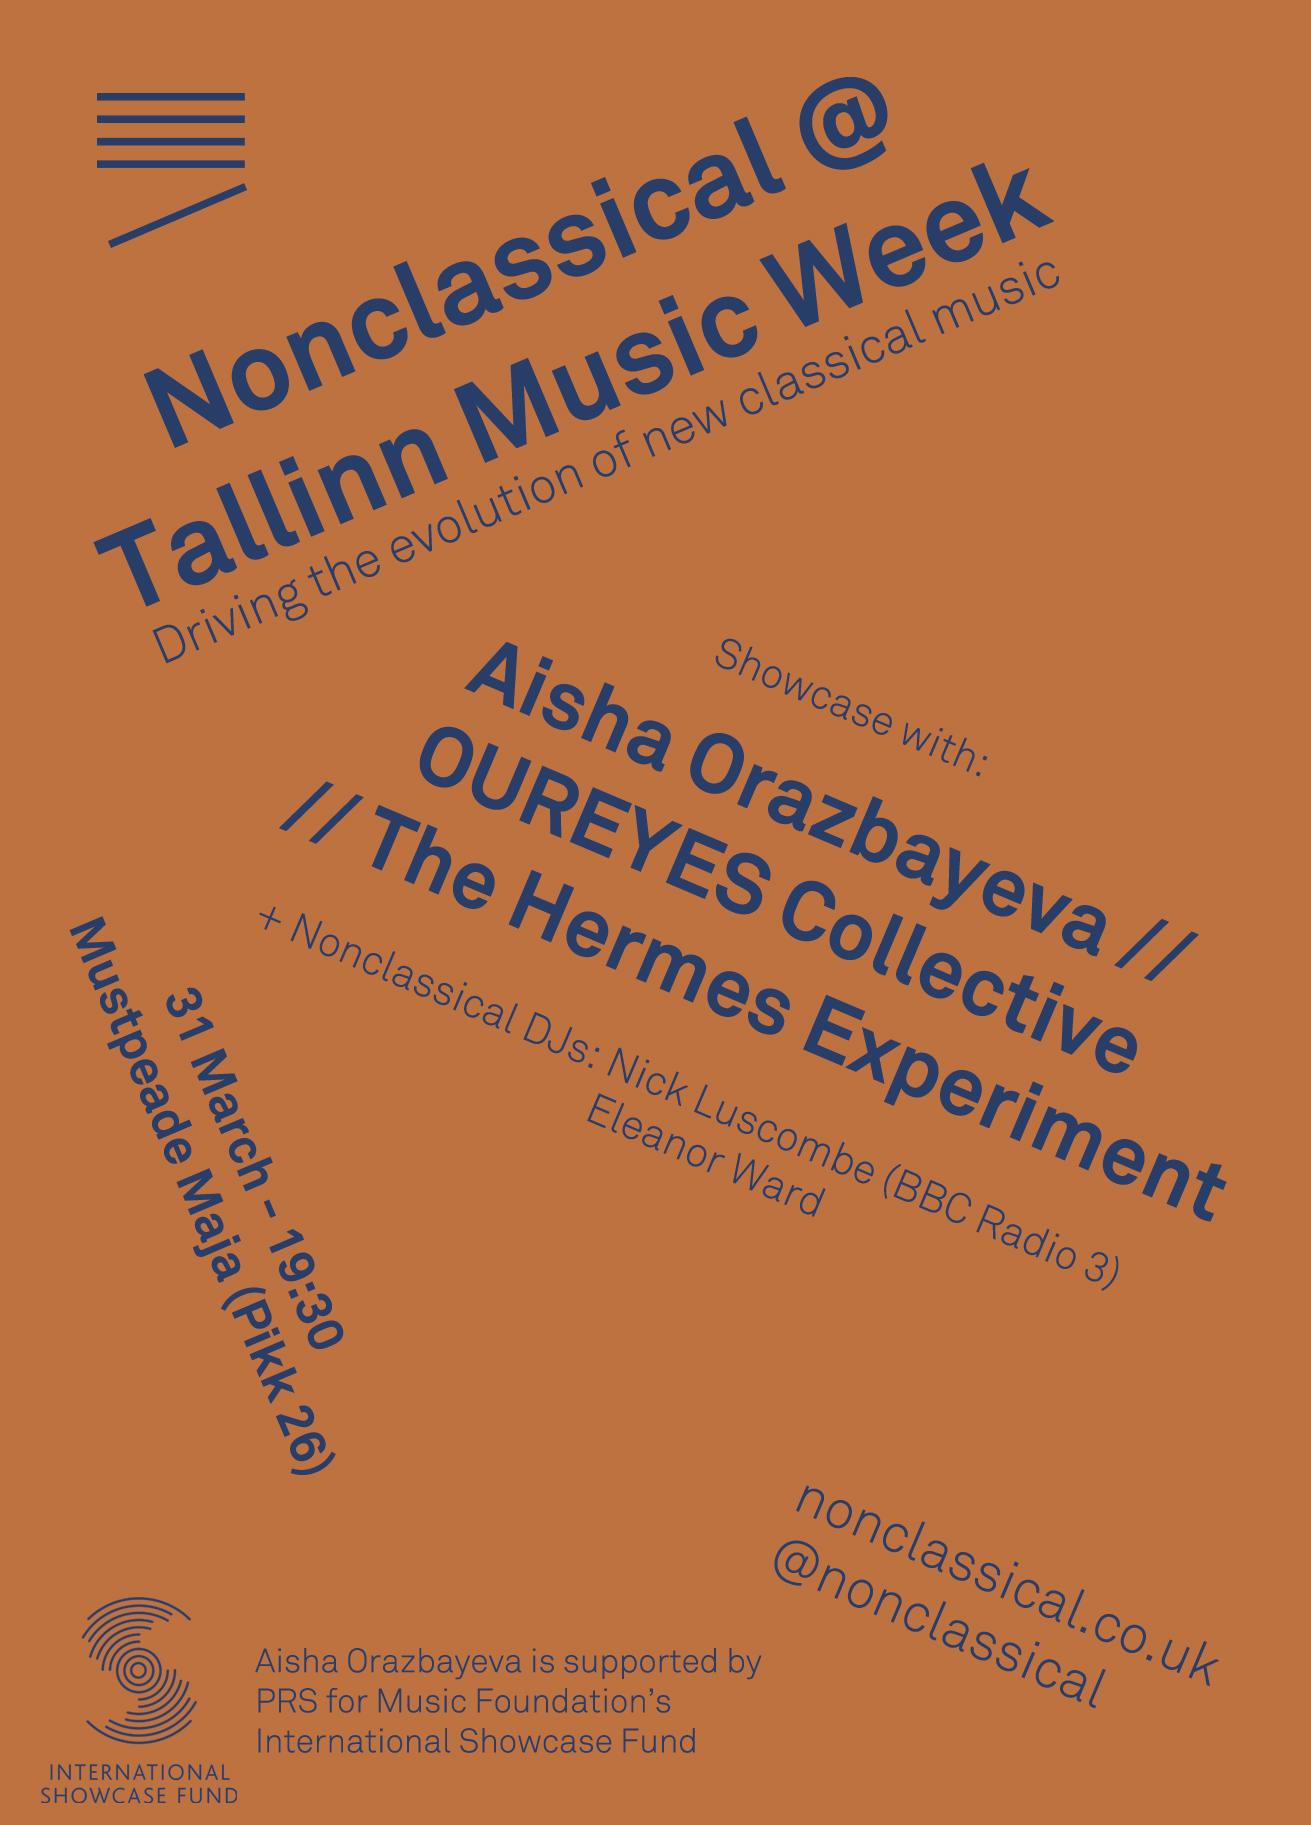 Nonclassical at Tallinn Music Week